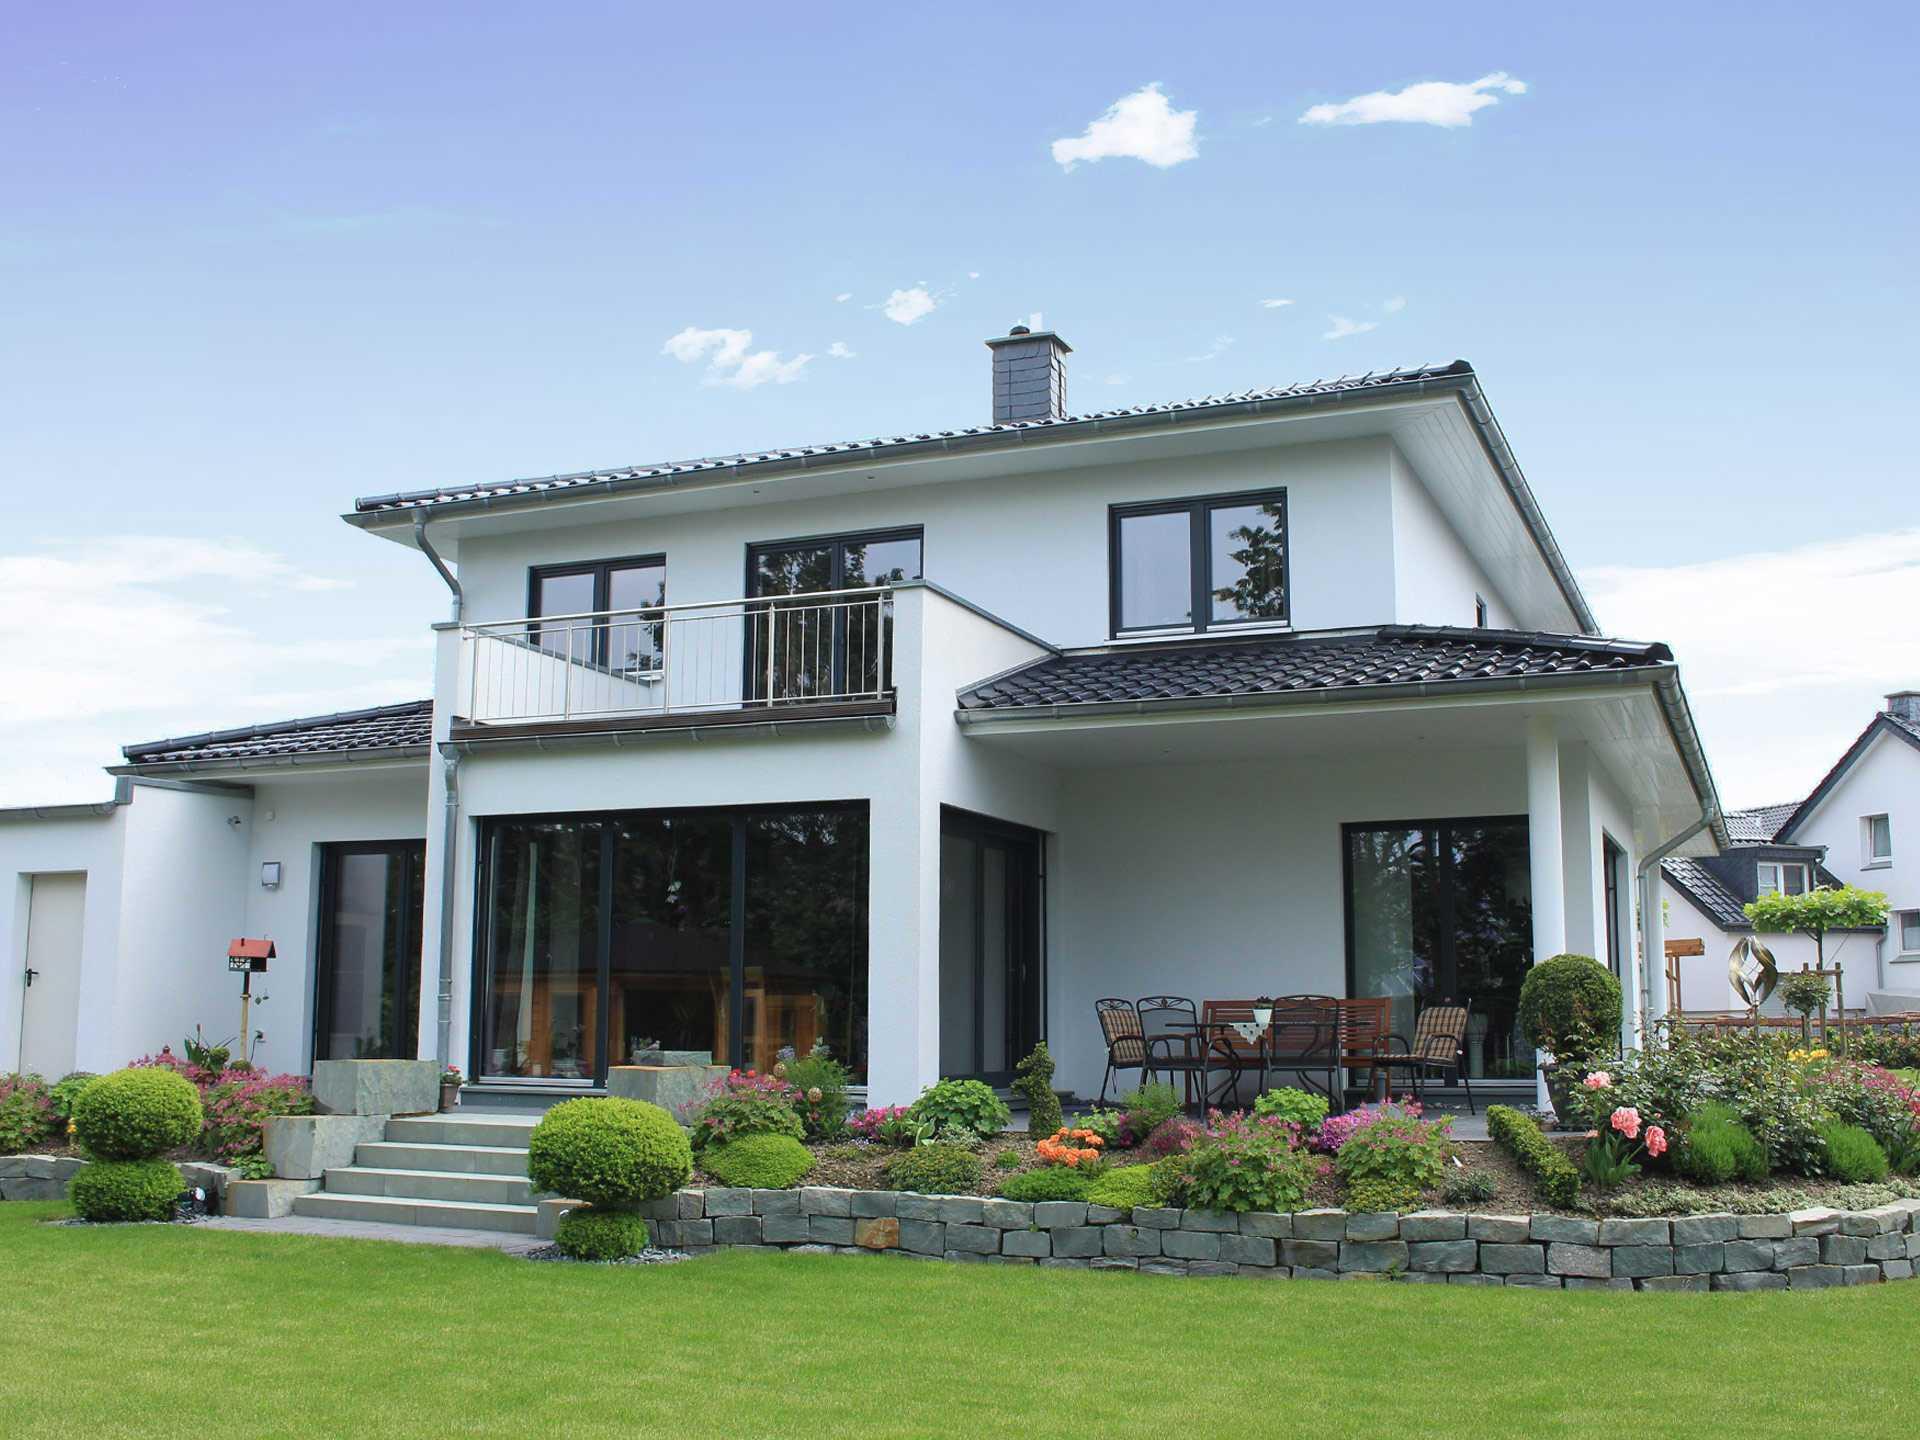 Theodor roreger holzbau for Moderner baustil einfamilienhaus